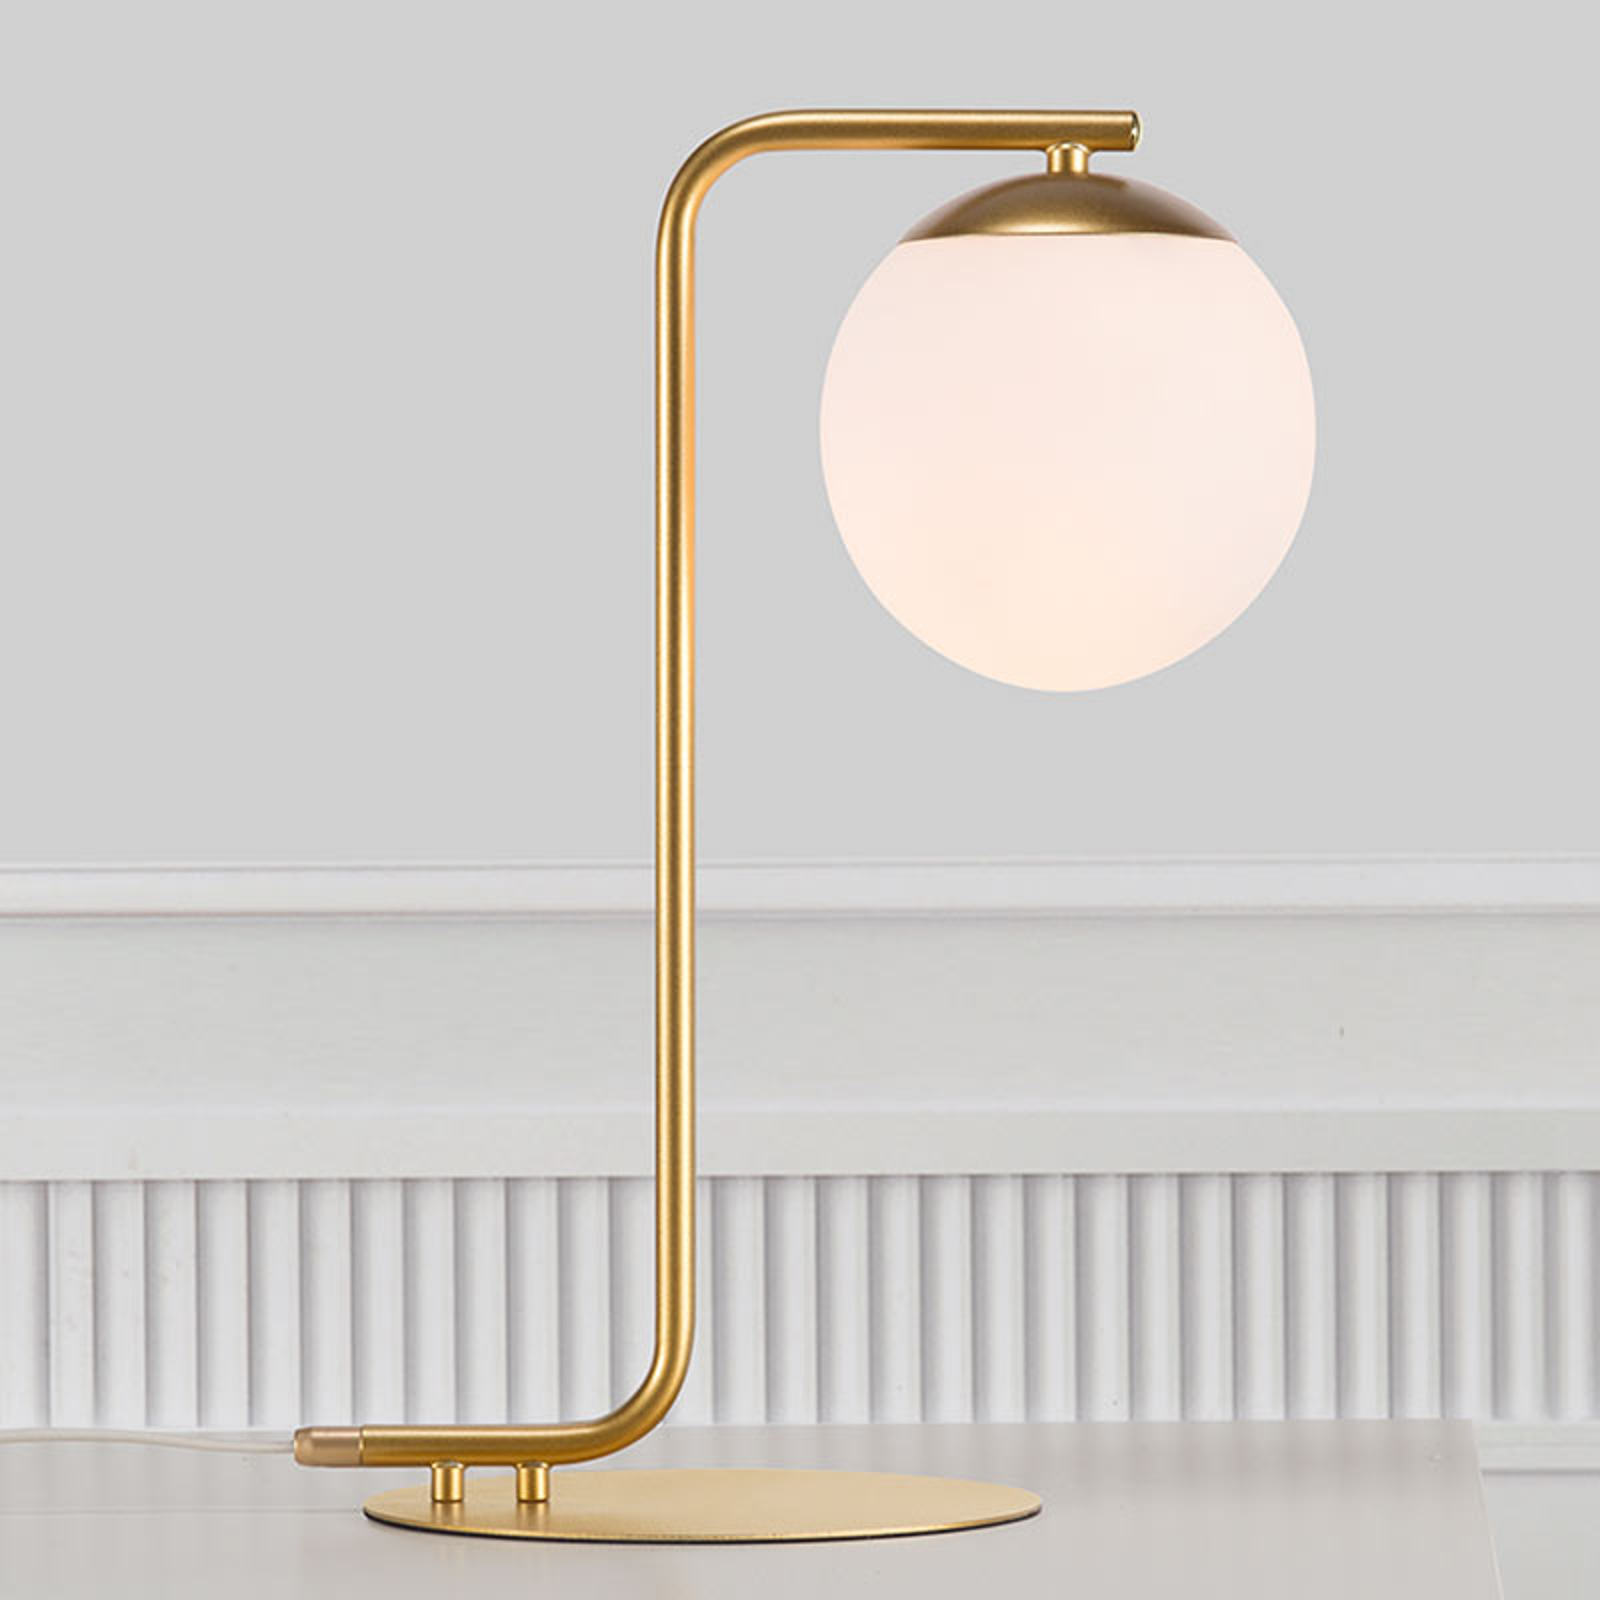 Lampa stołowa Grant, mosiądz